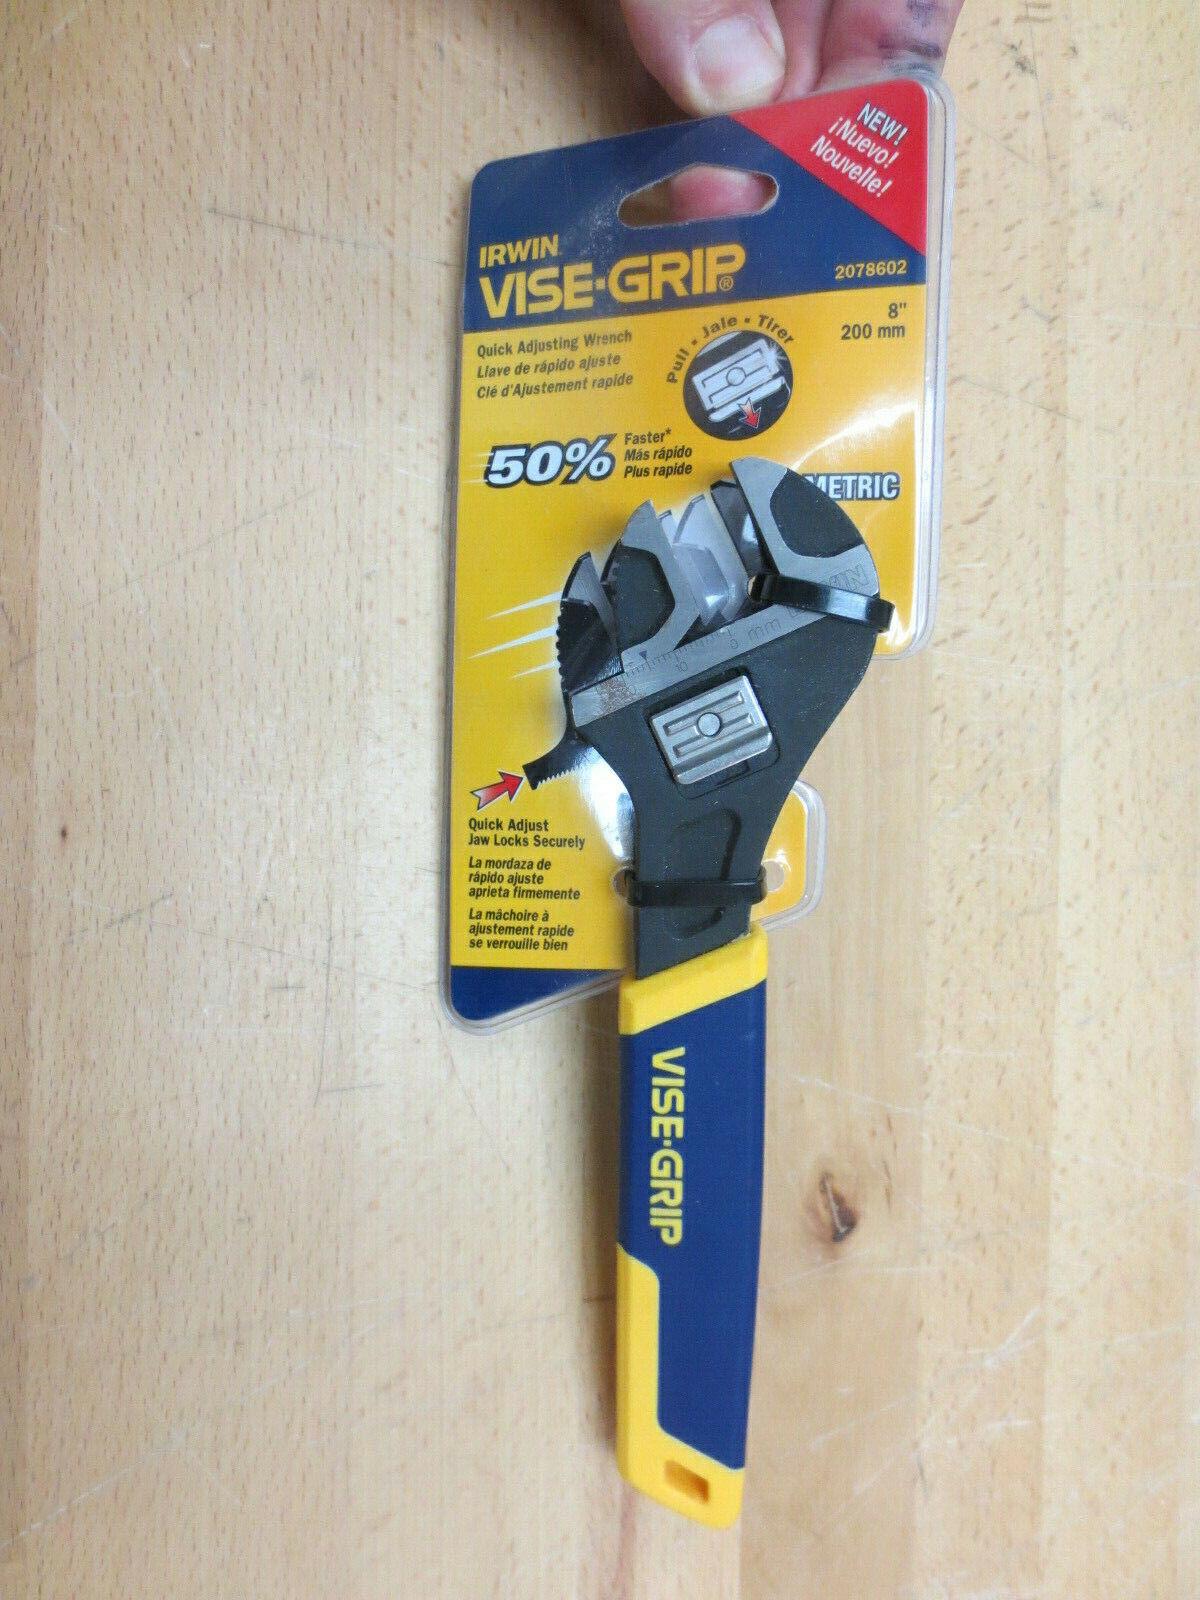 Irwin 2078602 8 Inch Metric Quick Adjusting Wrench-Taiwan!